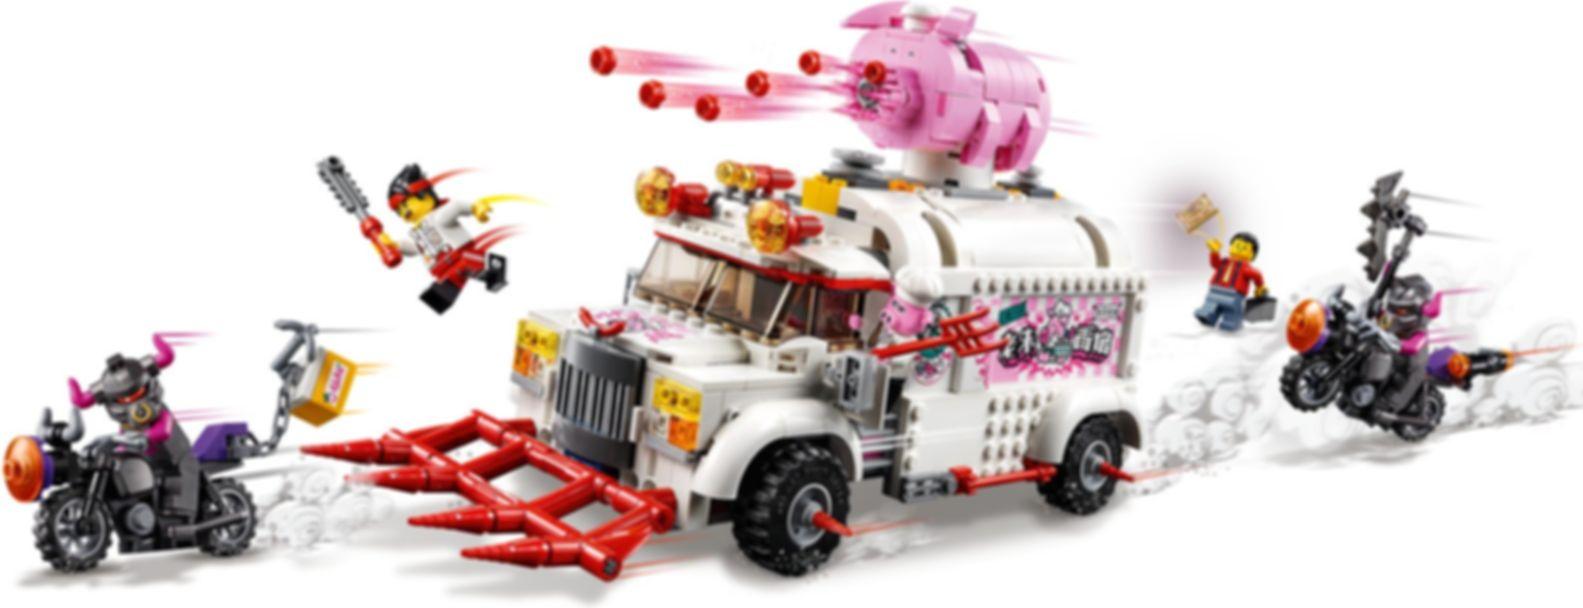 LEGO® Monkie Kid Pigsy's Food Truck gameplay